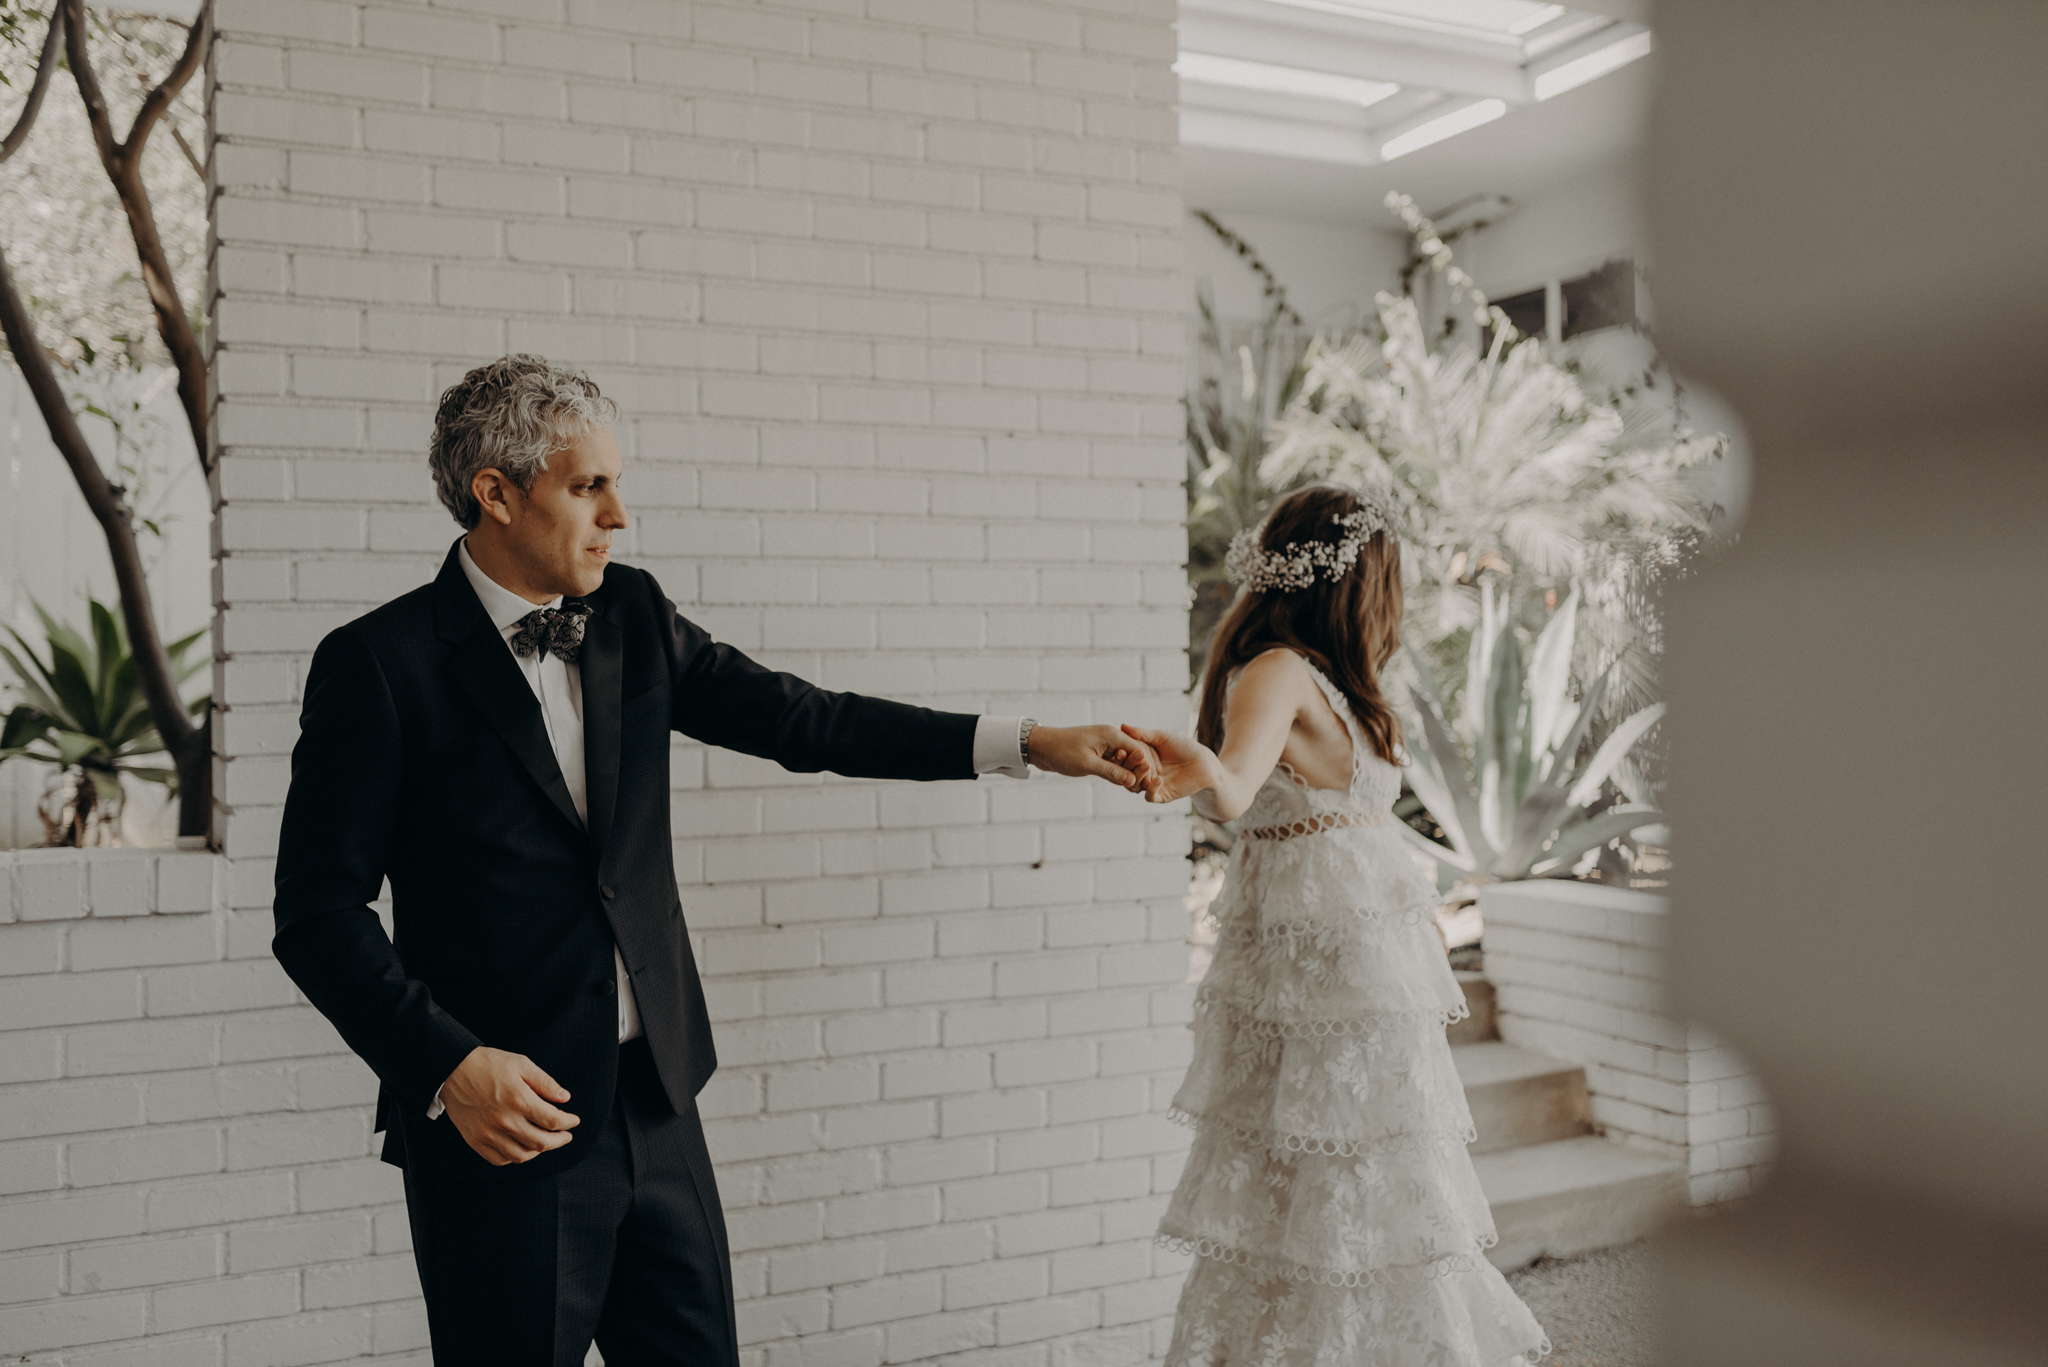 Isaiah + Taylor Photography - Private Estate Backyard Wedding - Beverly Hills - Los Angeles Wedding Photographer - 34.jpg